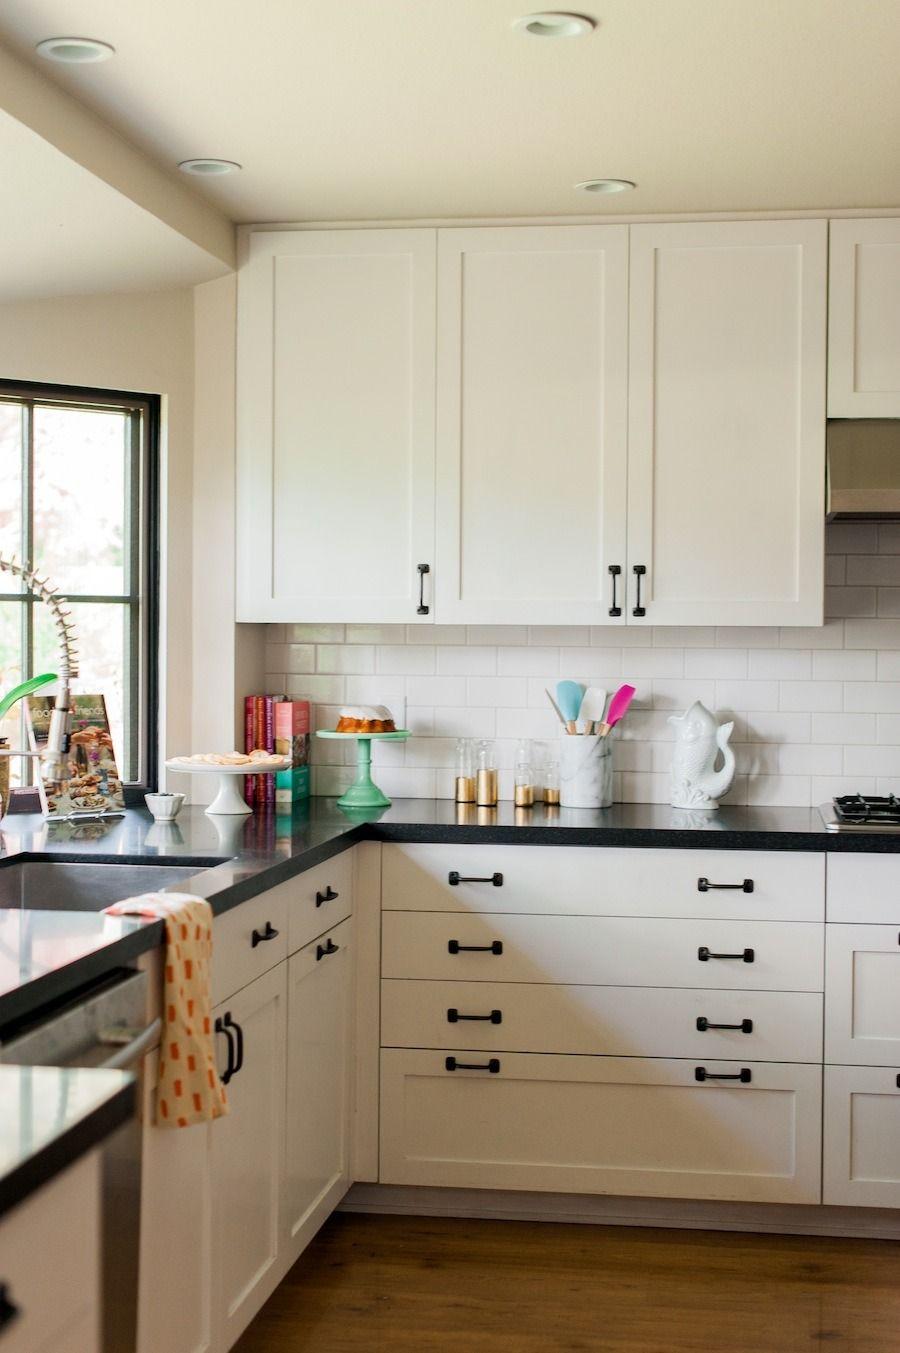 Download Wallpaper Black Kitchen Hardware On White Cabinets